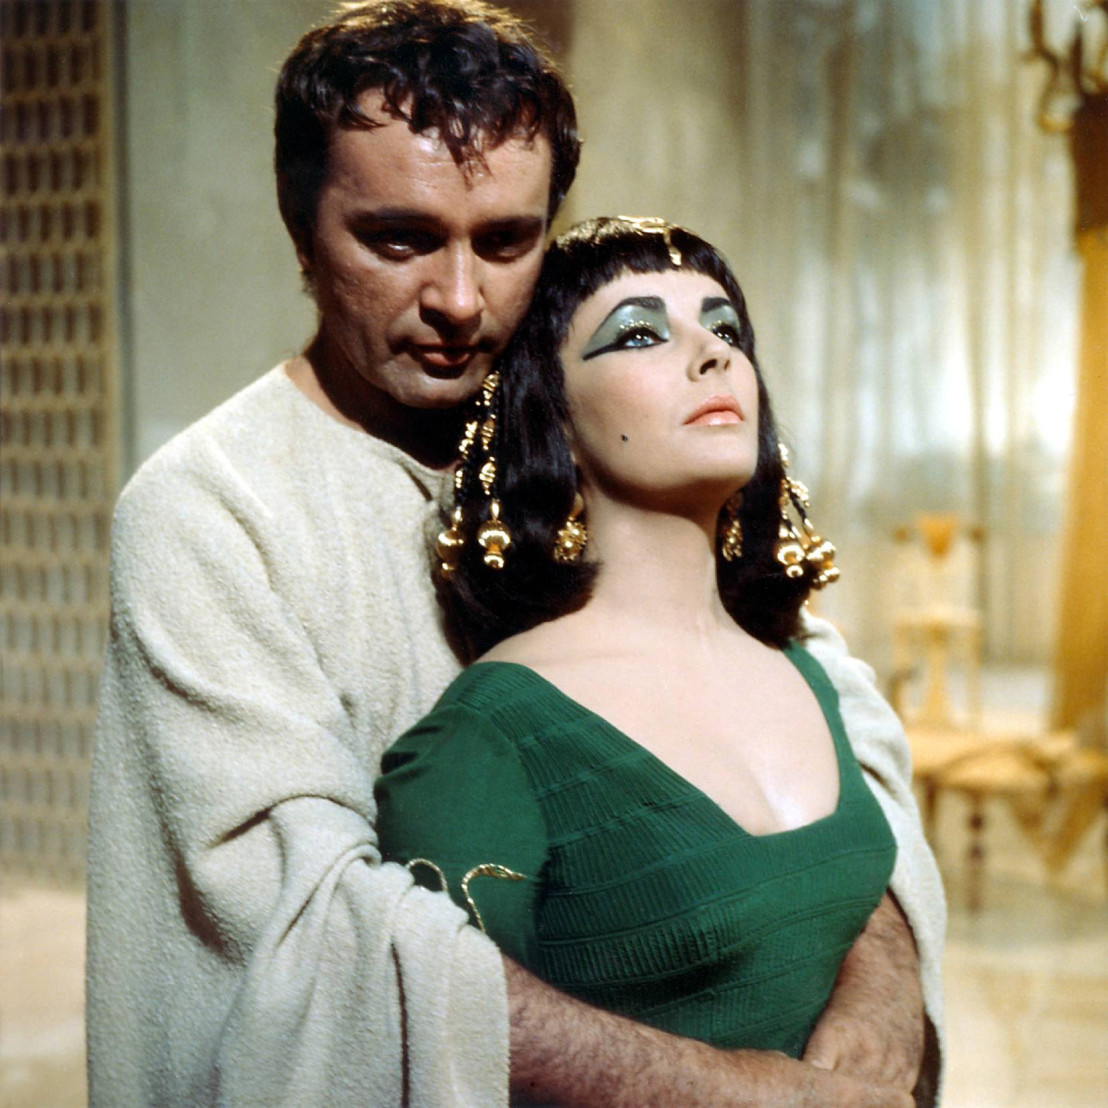 Anthony-Cleopatra